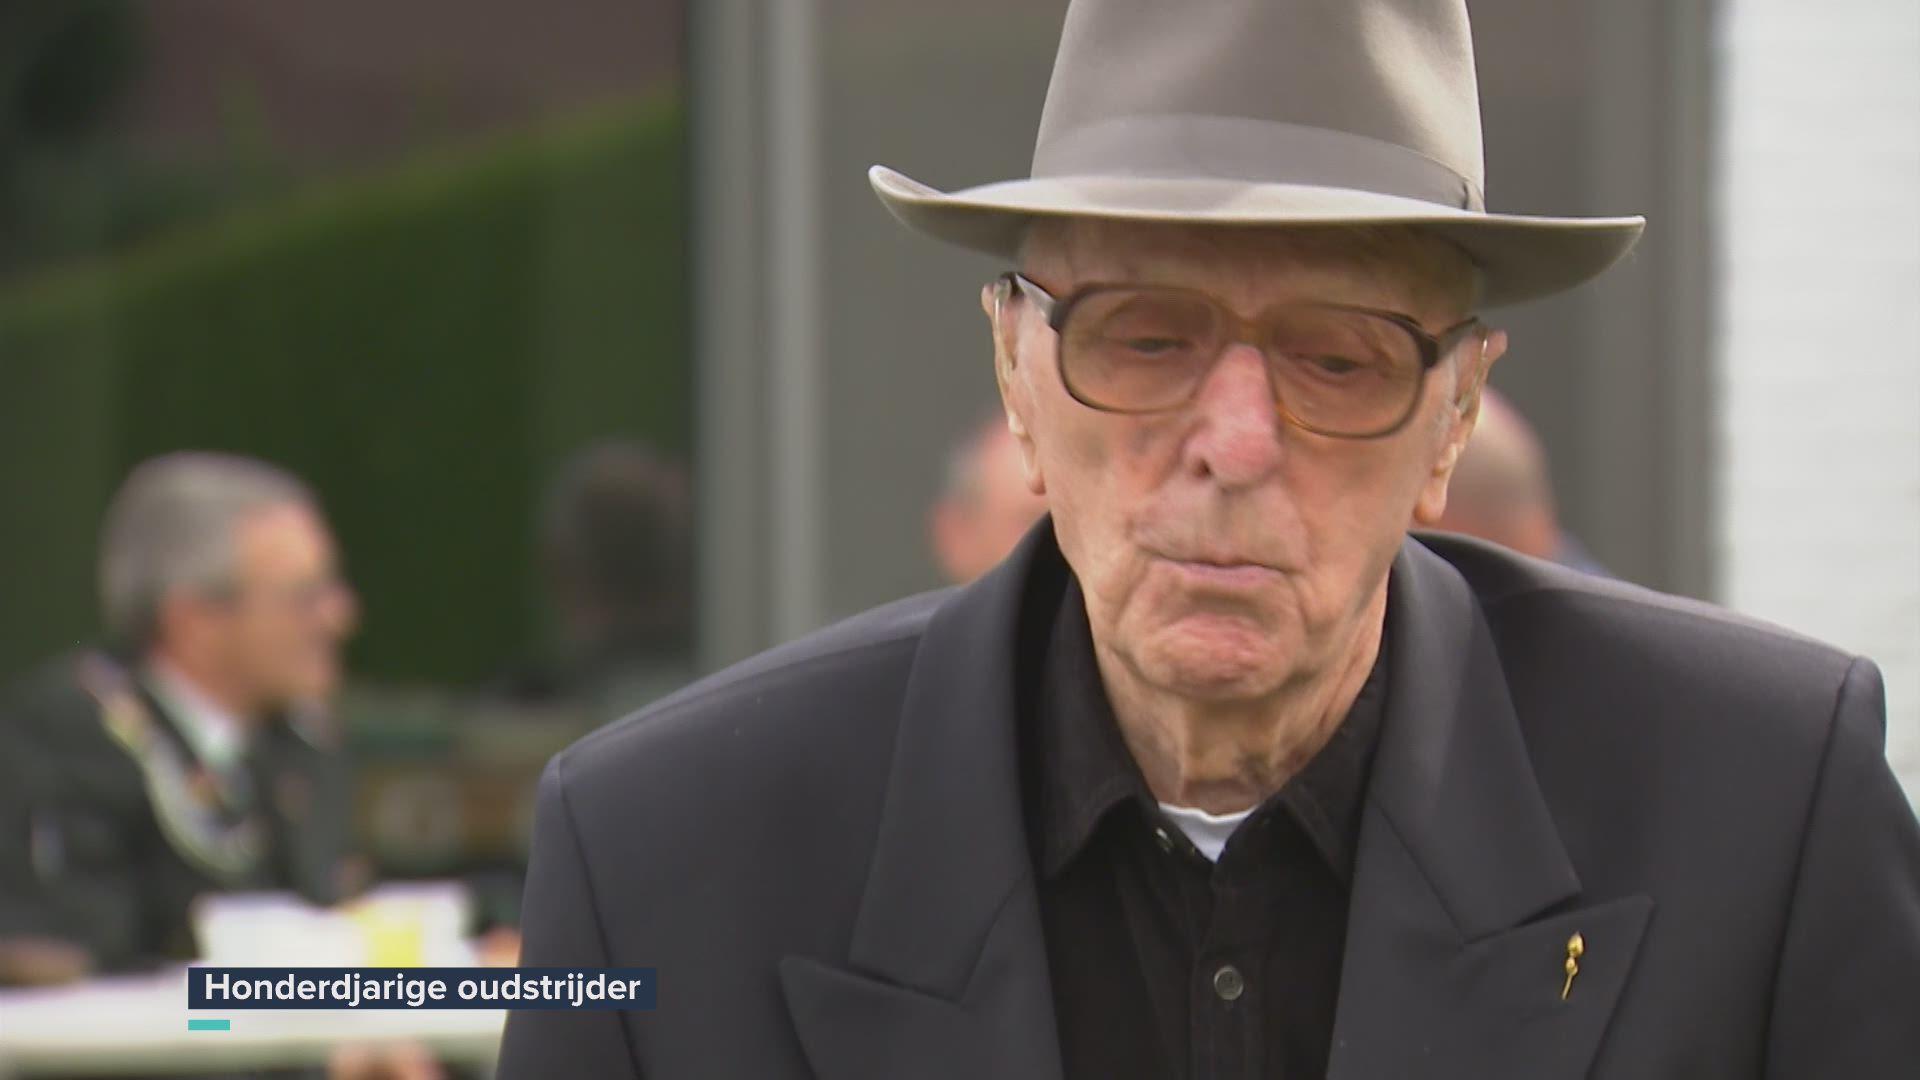 [VIDEO] - Honderdjarige Henri vocht in 1940 in 18-daagse veldtocht